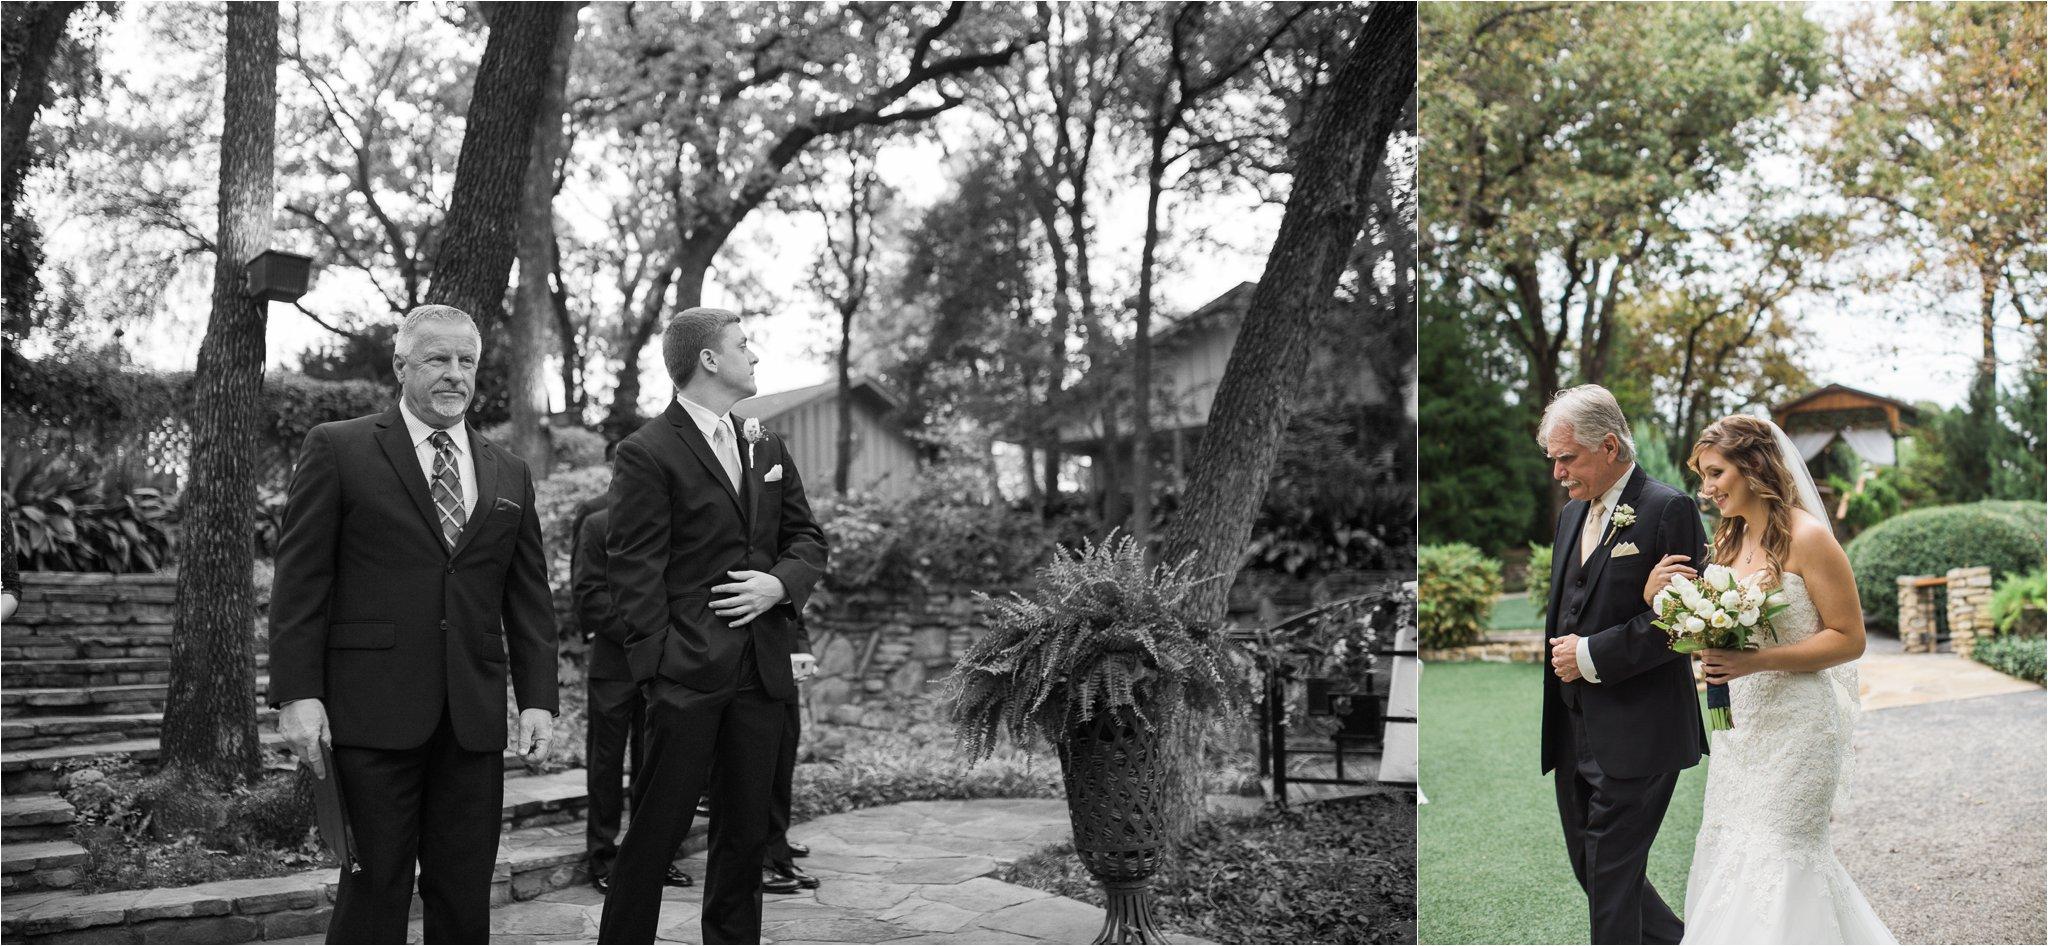 lunsford-wedding-519.jpg